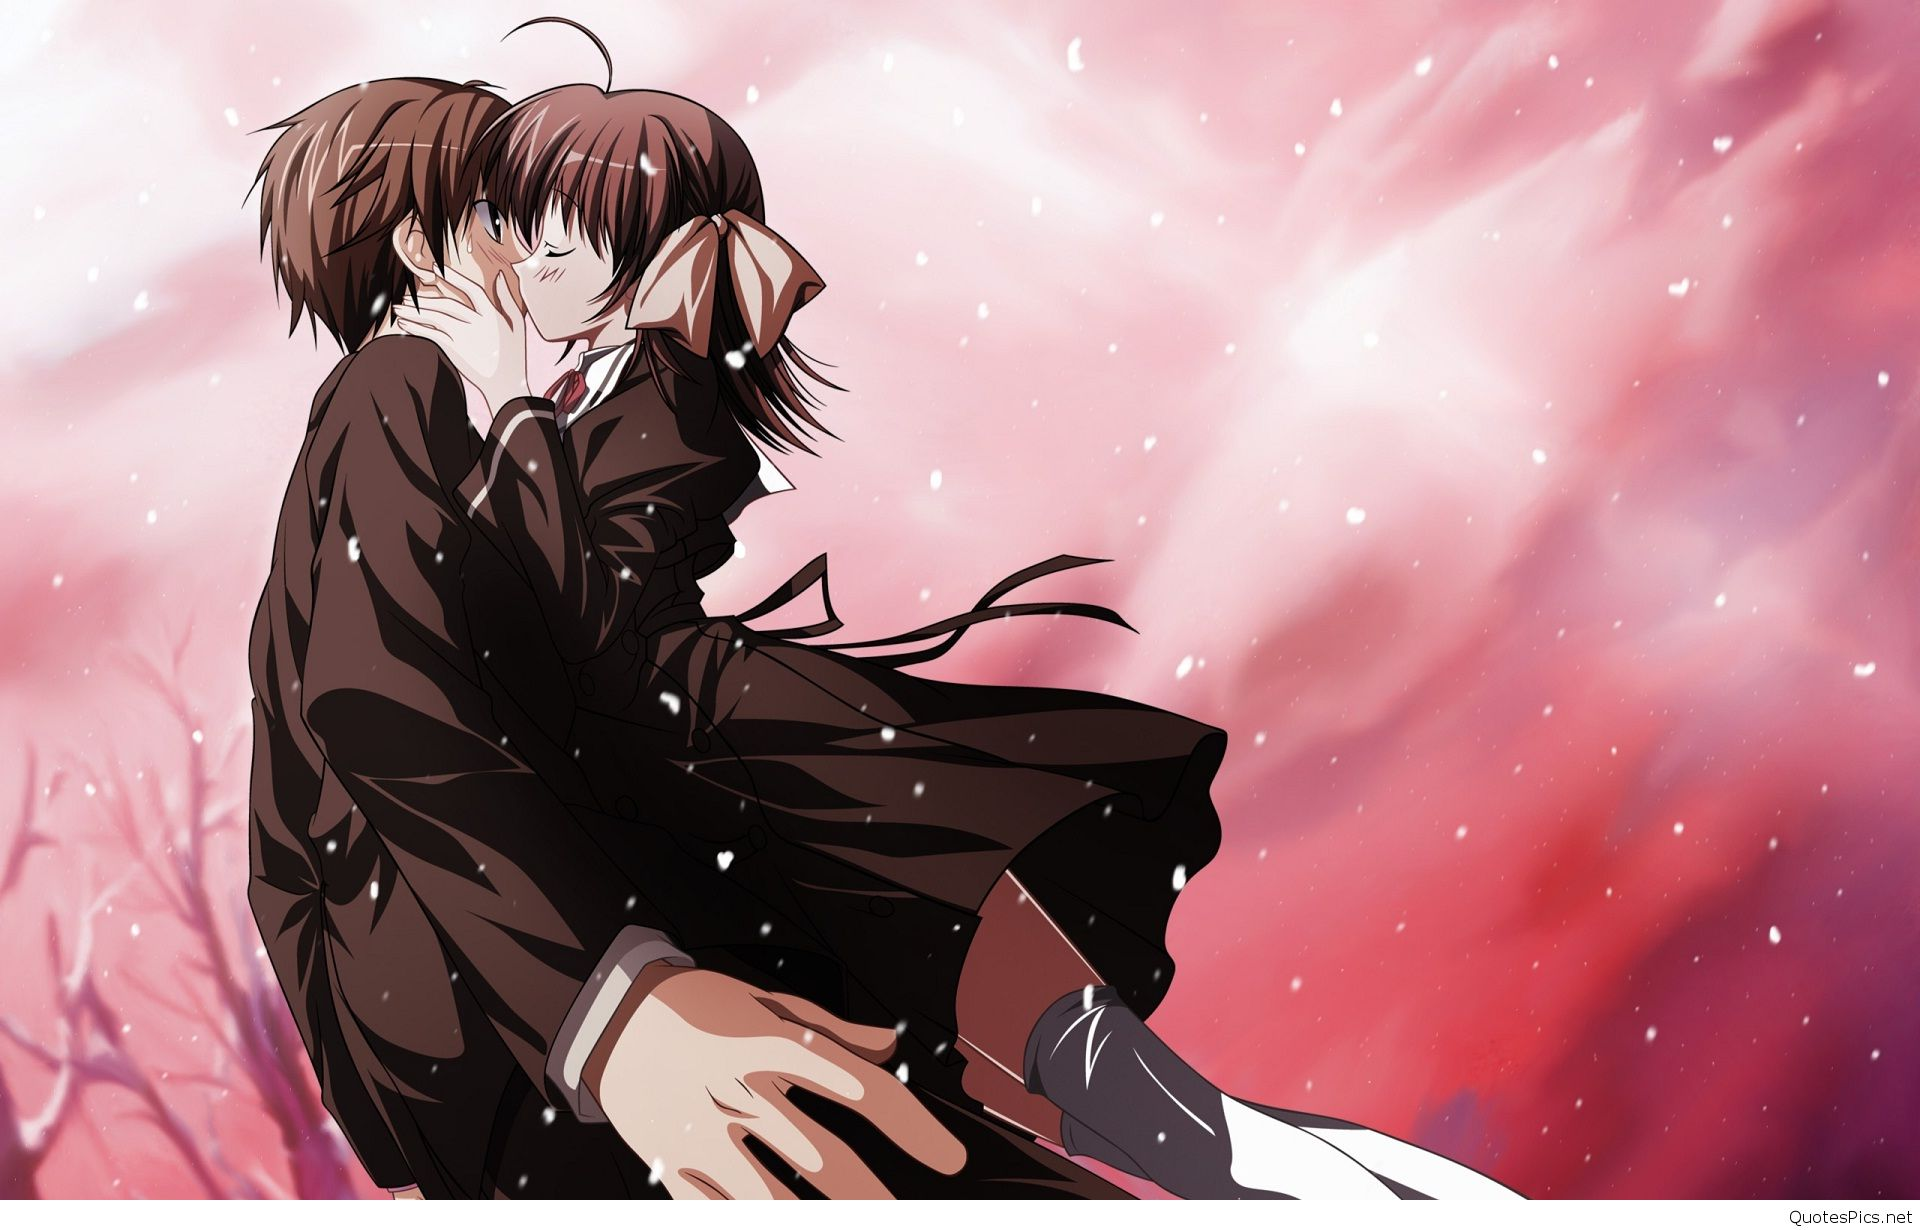 Cute Anime Couple Wallpaper 1920x1230